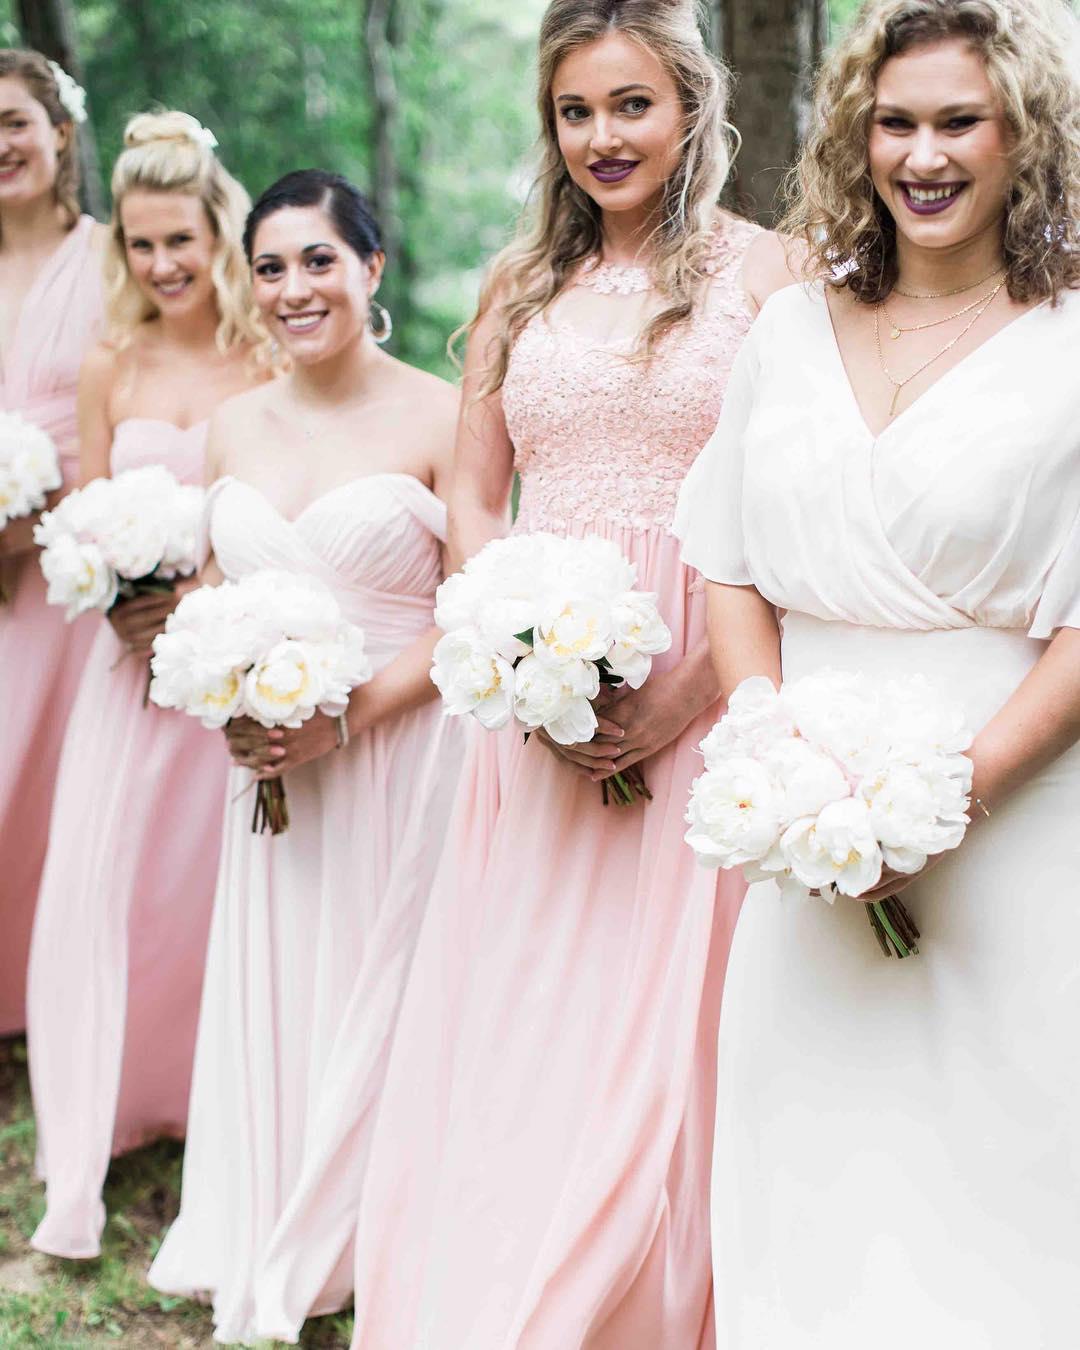 {blushing} photo | @jharperphoto . . . #hergirls #prettyinpink #peonies #blush #lovelies #bridesmaids #smiles #love #lotusfloraldesigns #weddingflowers #weddingflorist #nhwedding #squamlake